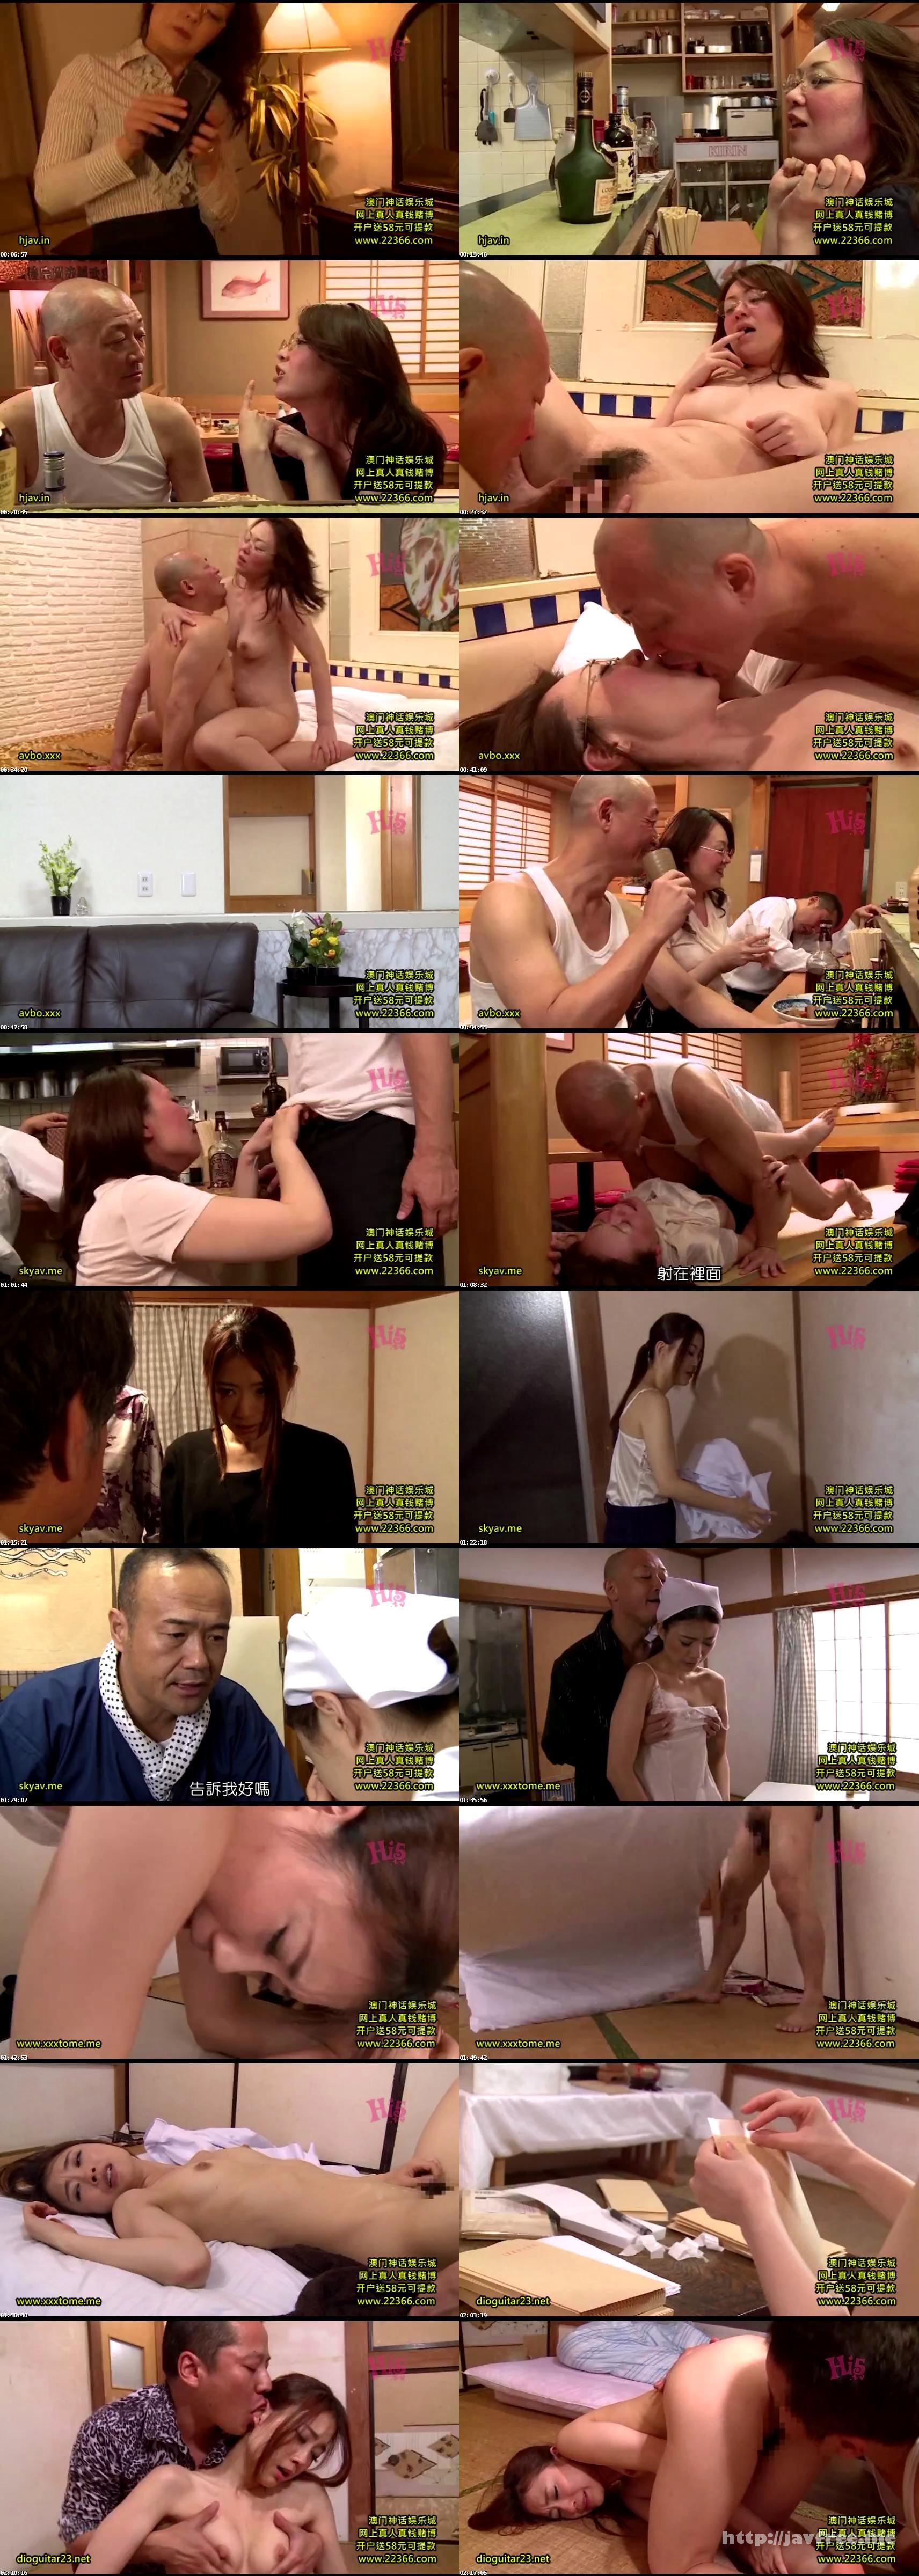 [NSPS 381] 夫は知らない… 他人に抱かれた人妻たち 愛花沙也 城野絵理香 NSPS